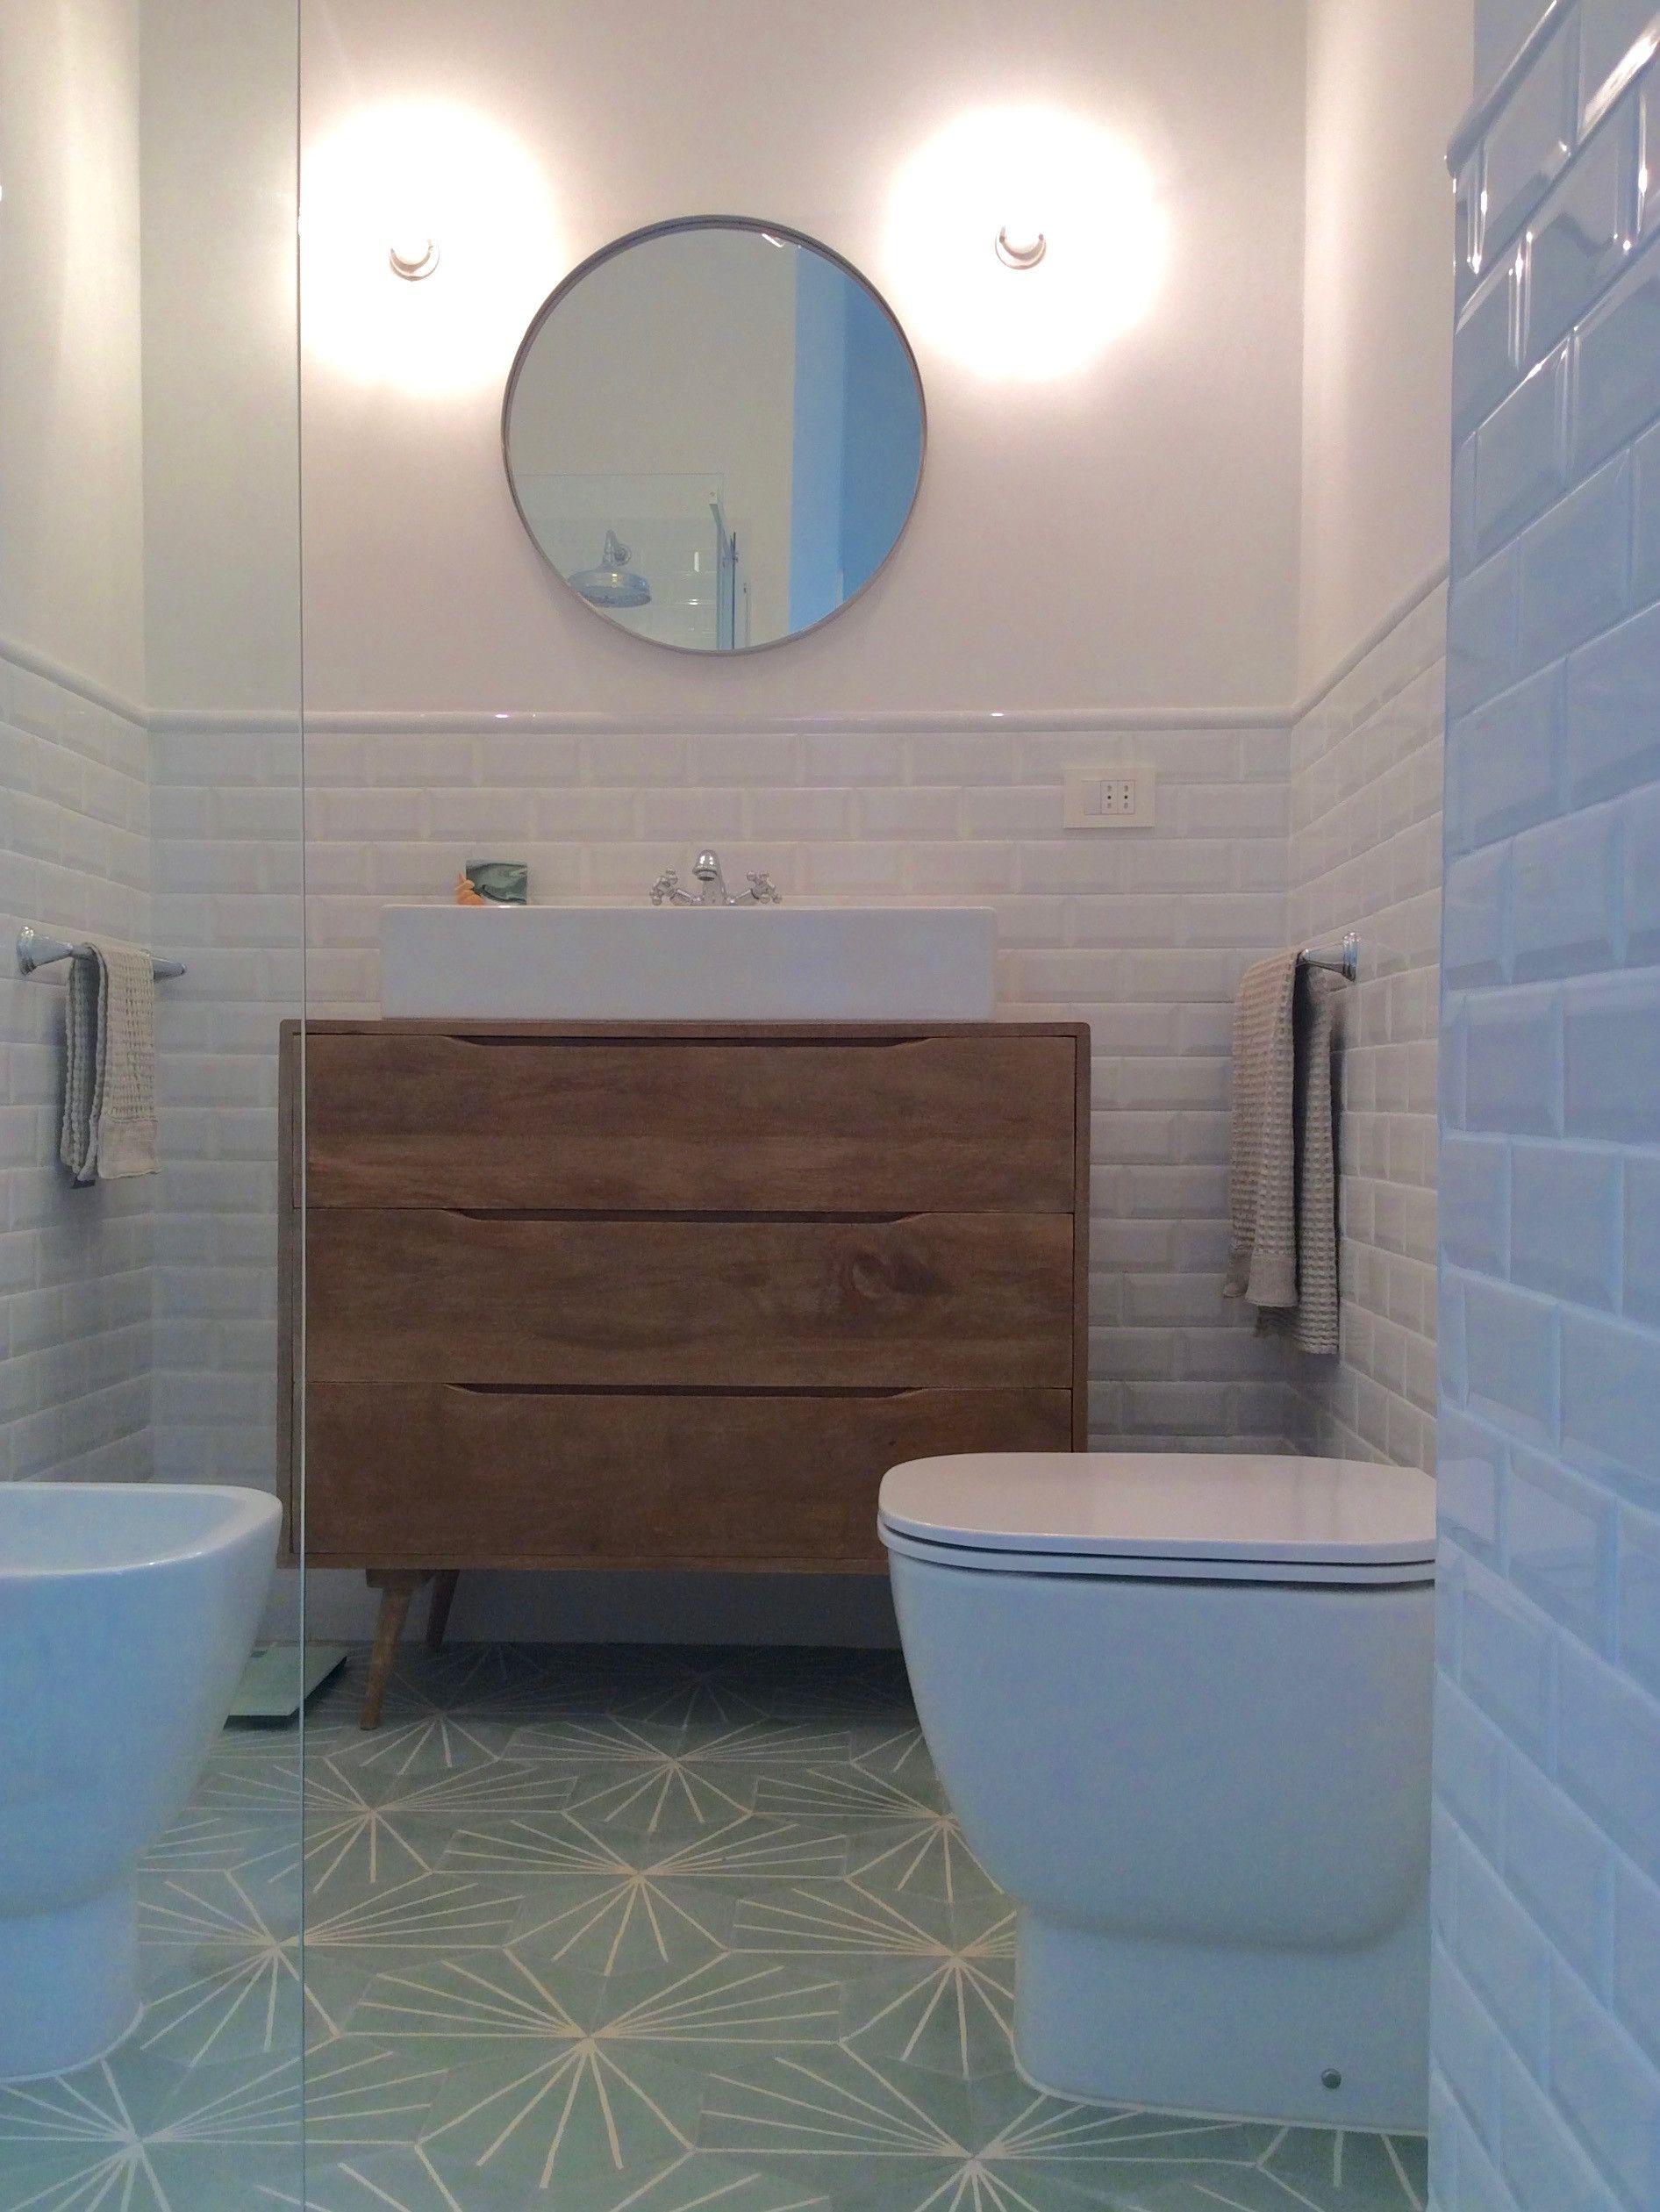 Pool House Bathroom Ideas Classy Dandelion  Celadonmilk Pool House  Maison  Pinterest 2017